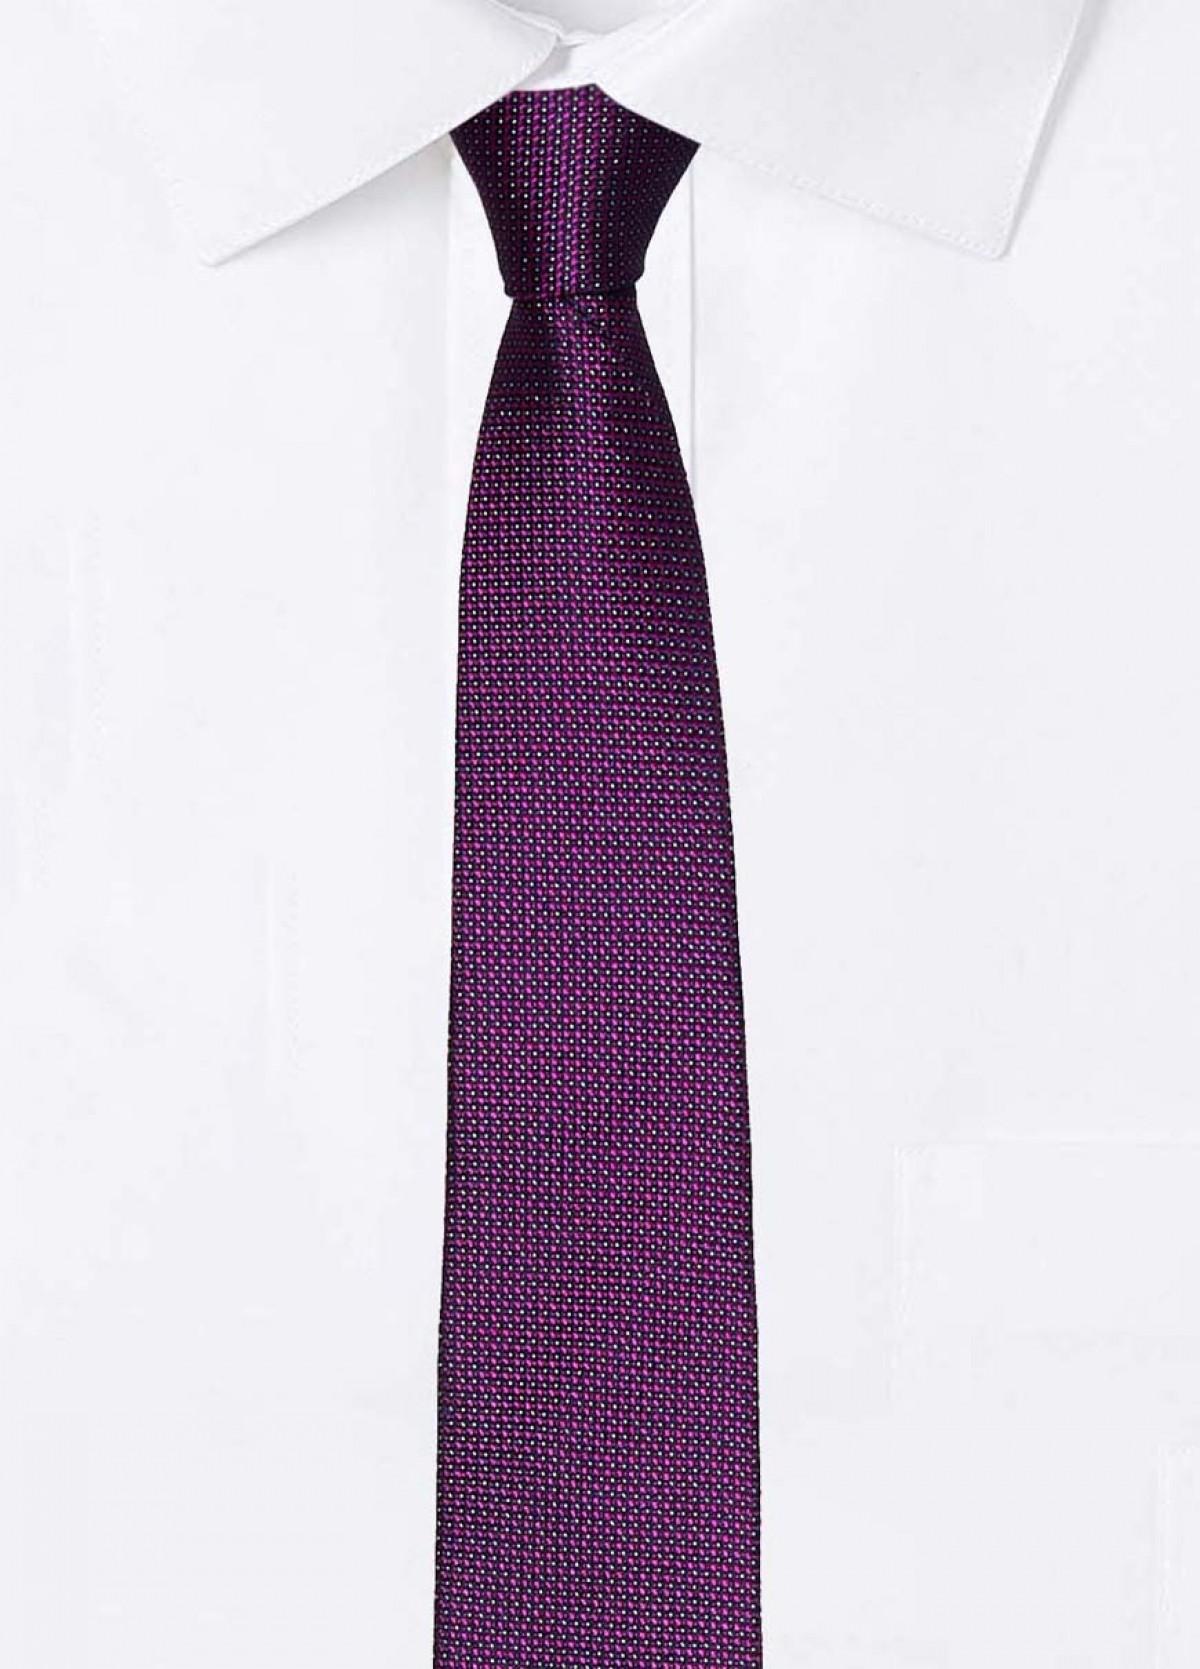 The Mauve Stain Resistant Tie